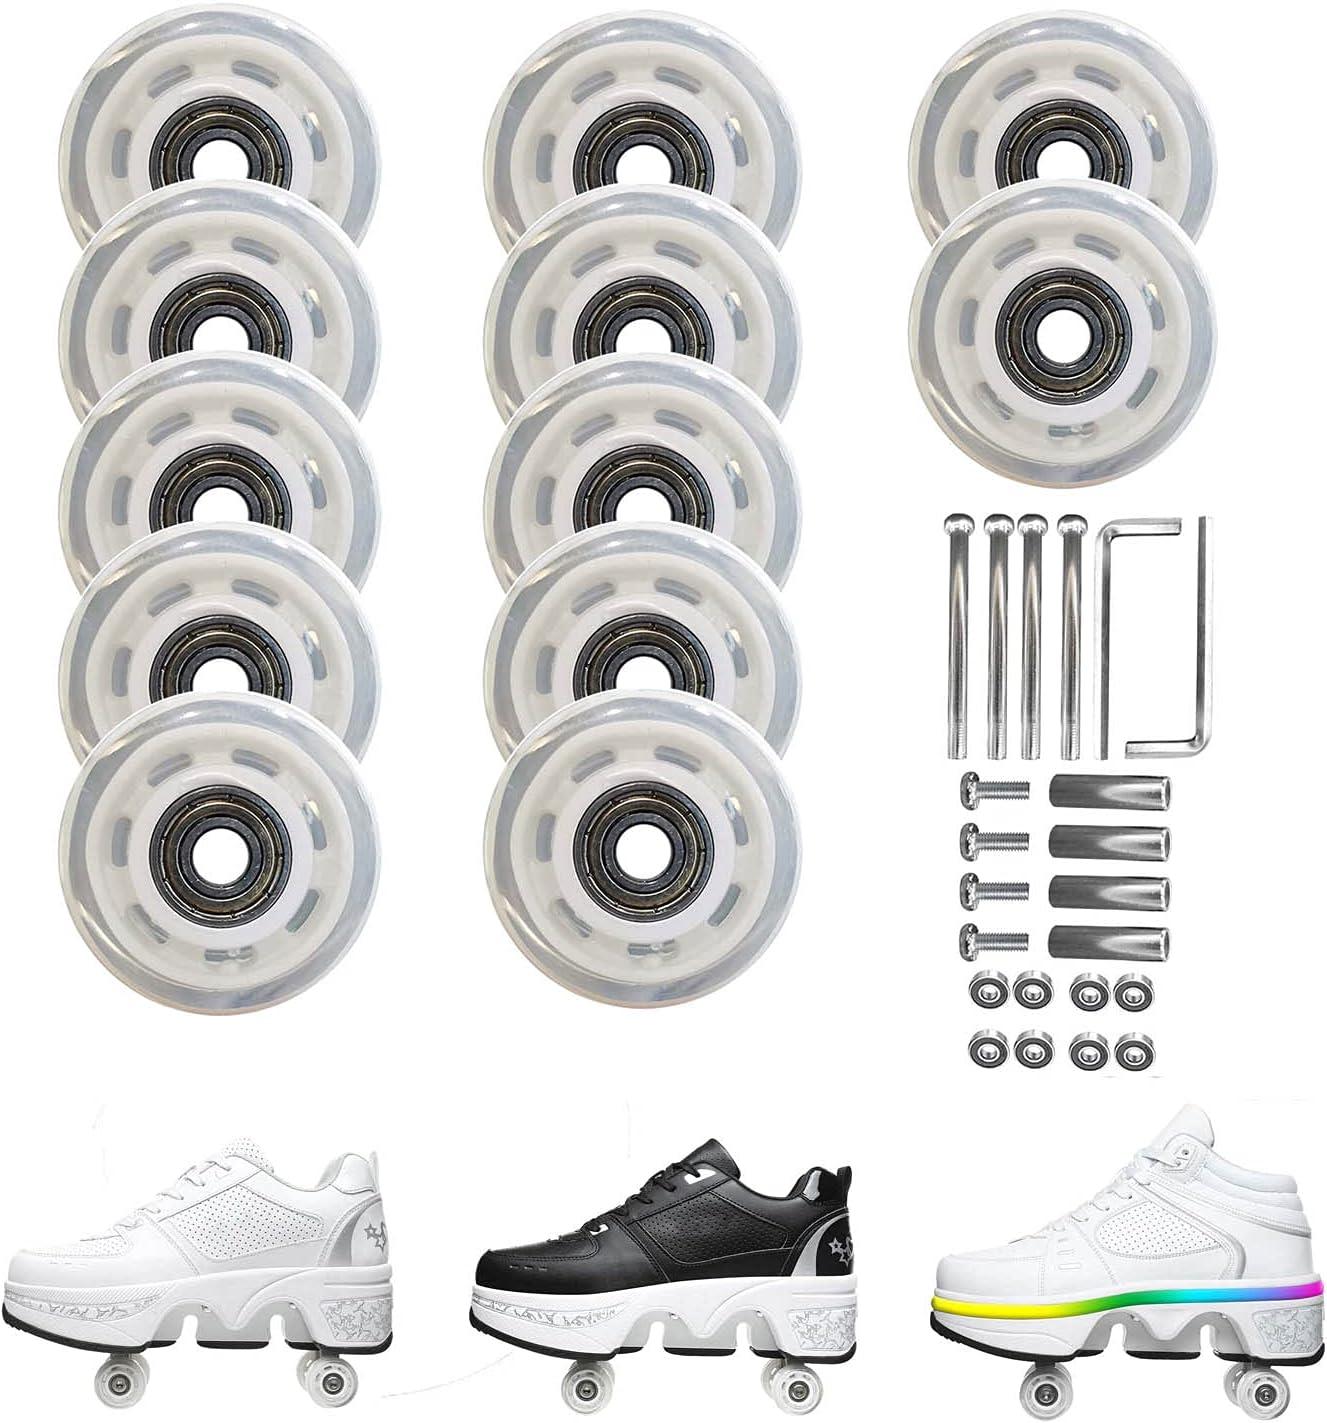 Roller Skate [Alternative dealer] Wheels with Outdoor Installed- Complete Free Shipping Ska Bearings